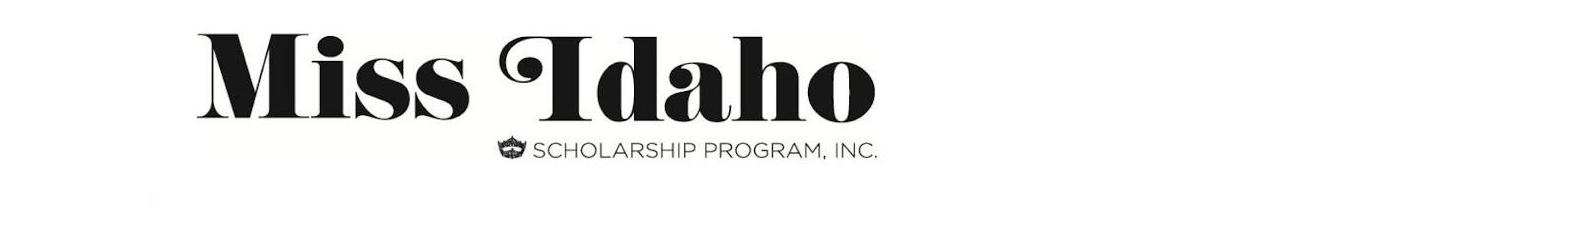 Miss Idaho Organization